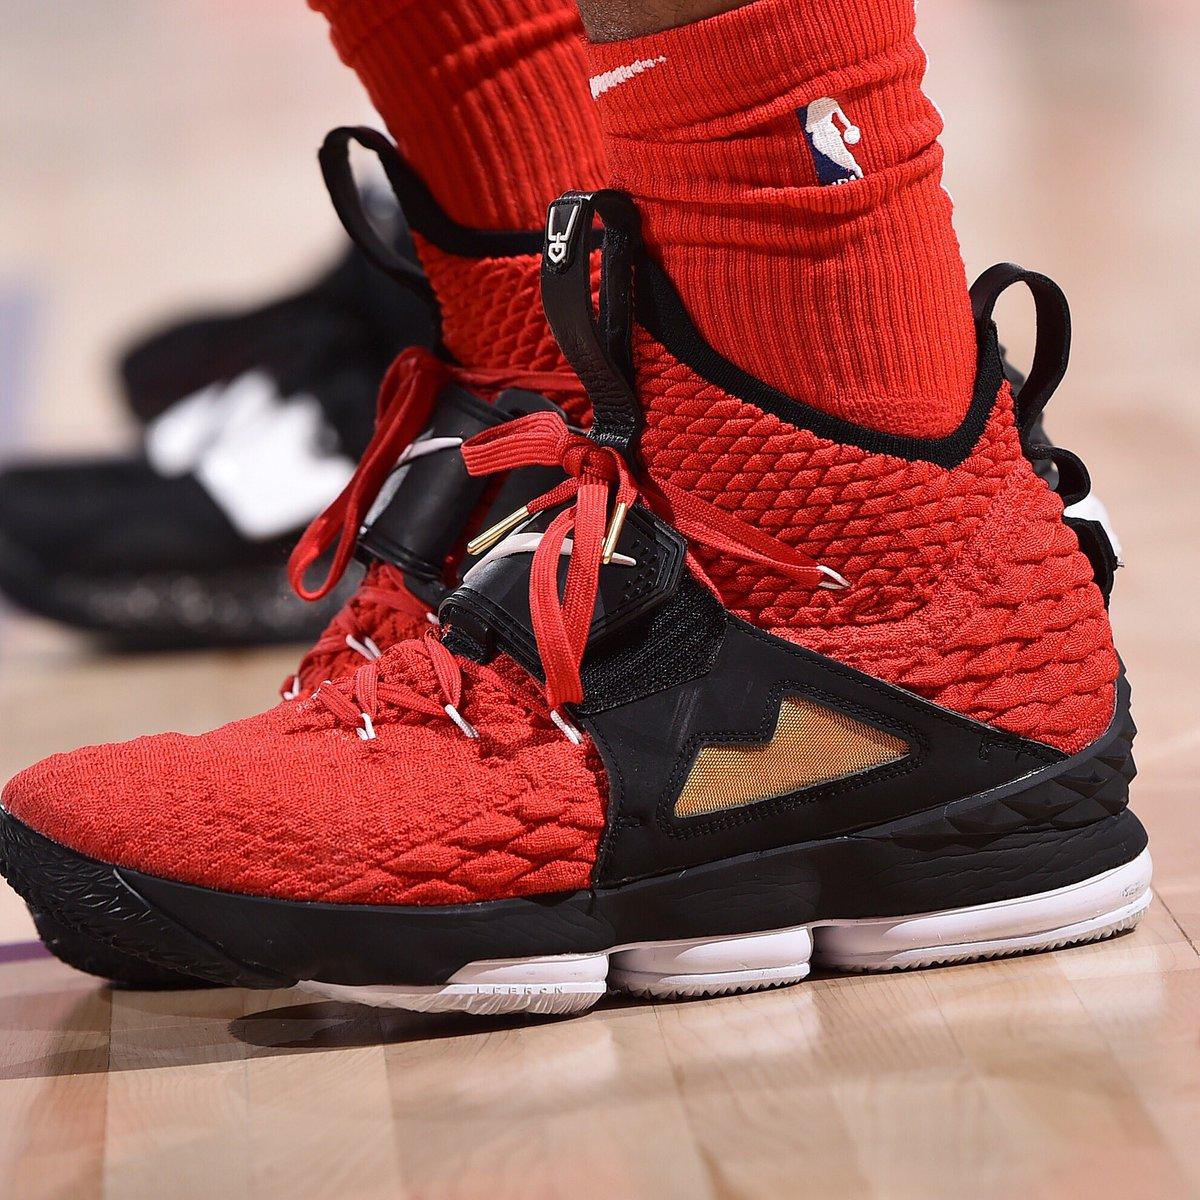 More than just OK... @CmoHutchison breaks out the Red Diamond Turf Nike LeBron 15!   #ATT #CourtsideKicks #NBAKicks